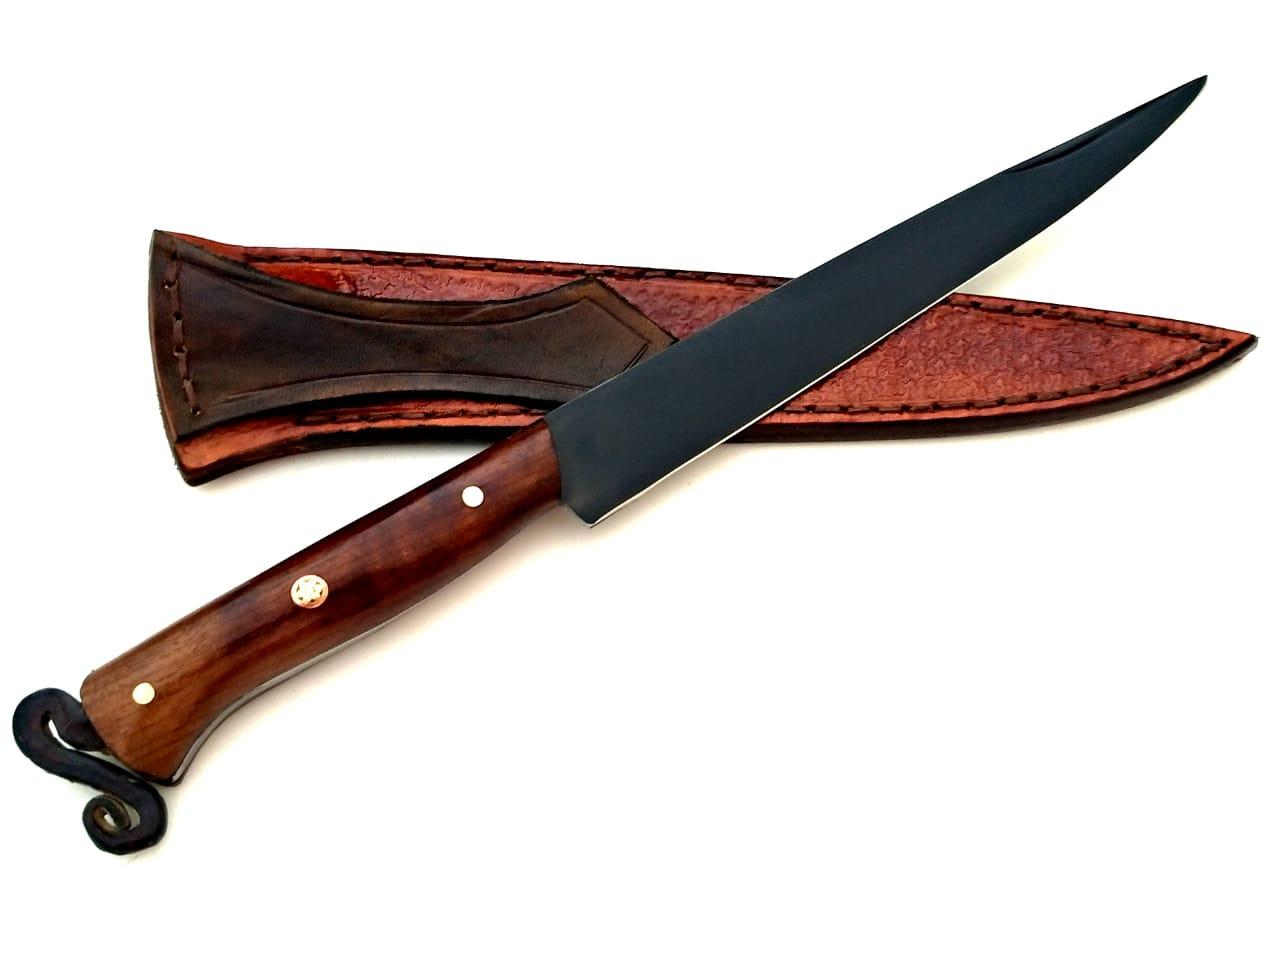 Faca artesanal forjada de lima antiga 7 polegadas